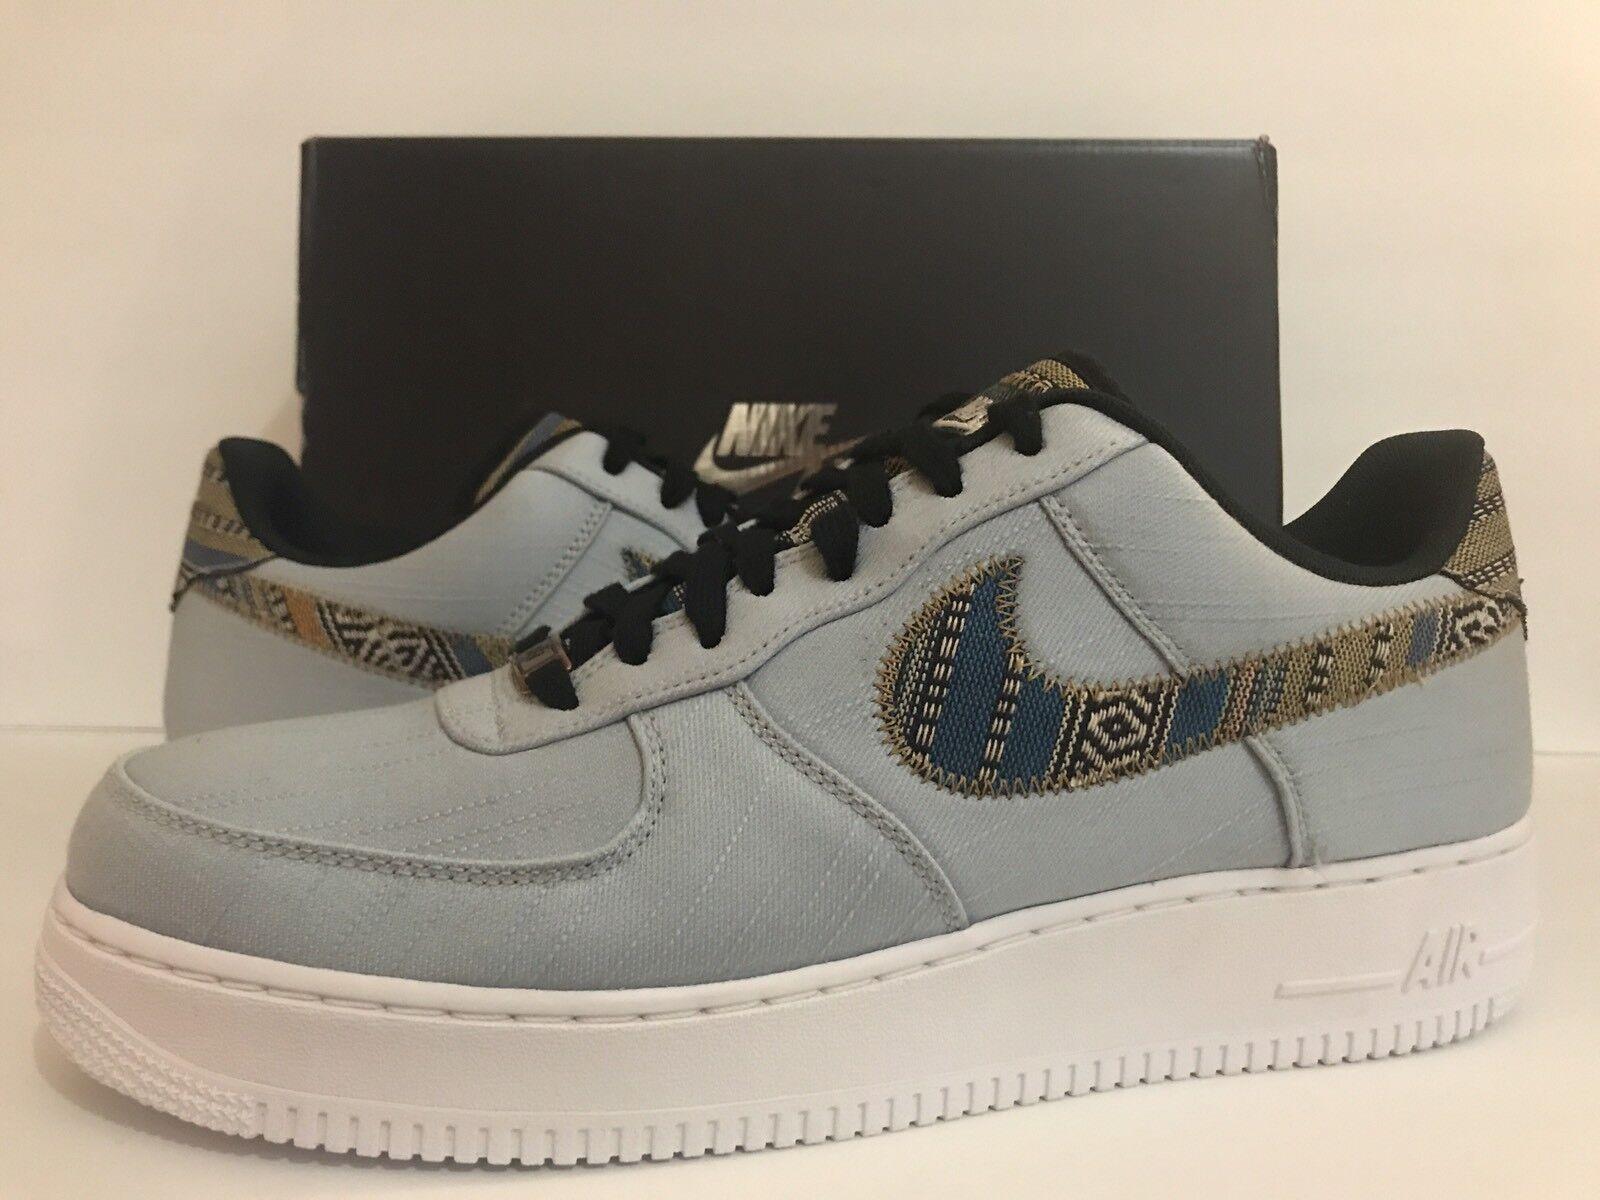 Nike Air Force 1 '07 LV8 LT/Almory/Blue/White/Black 718152-407 Sz 12 Cheap and beautiful fashion